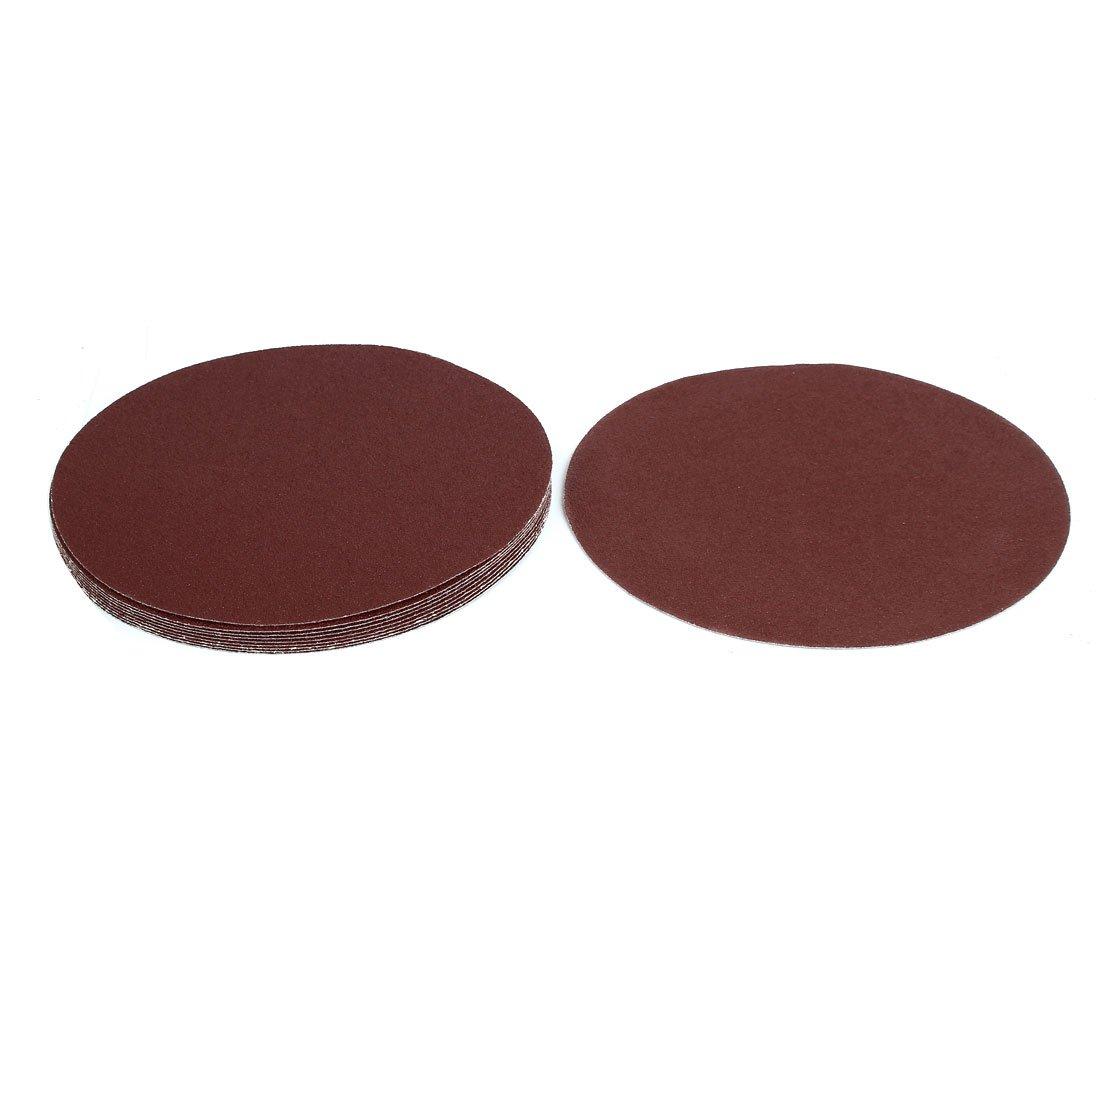 sourcingmap 9-inch Dia 60 Grits Sanding Disc Polishing Pad Flocking Sandpaper 10pcs